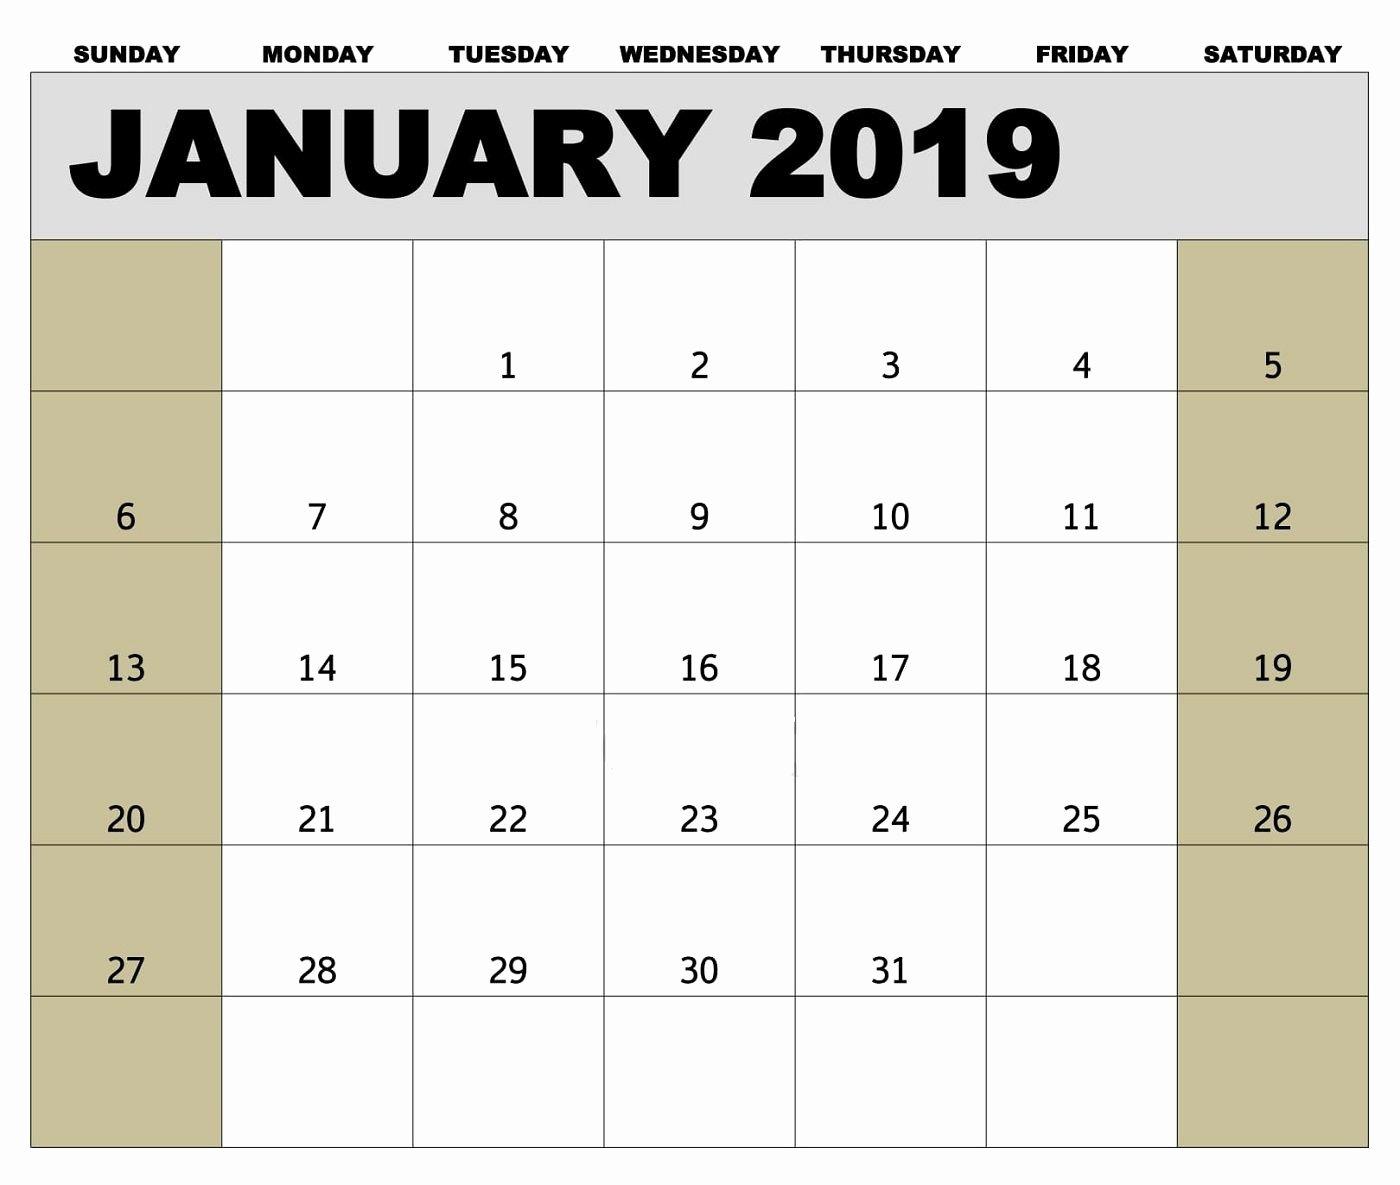 2019 Biweekly Payroll Calendar Template Awesome 2019 Payroll Calendar Printable